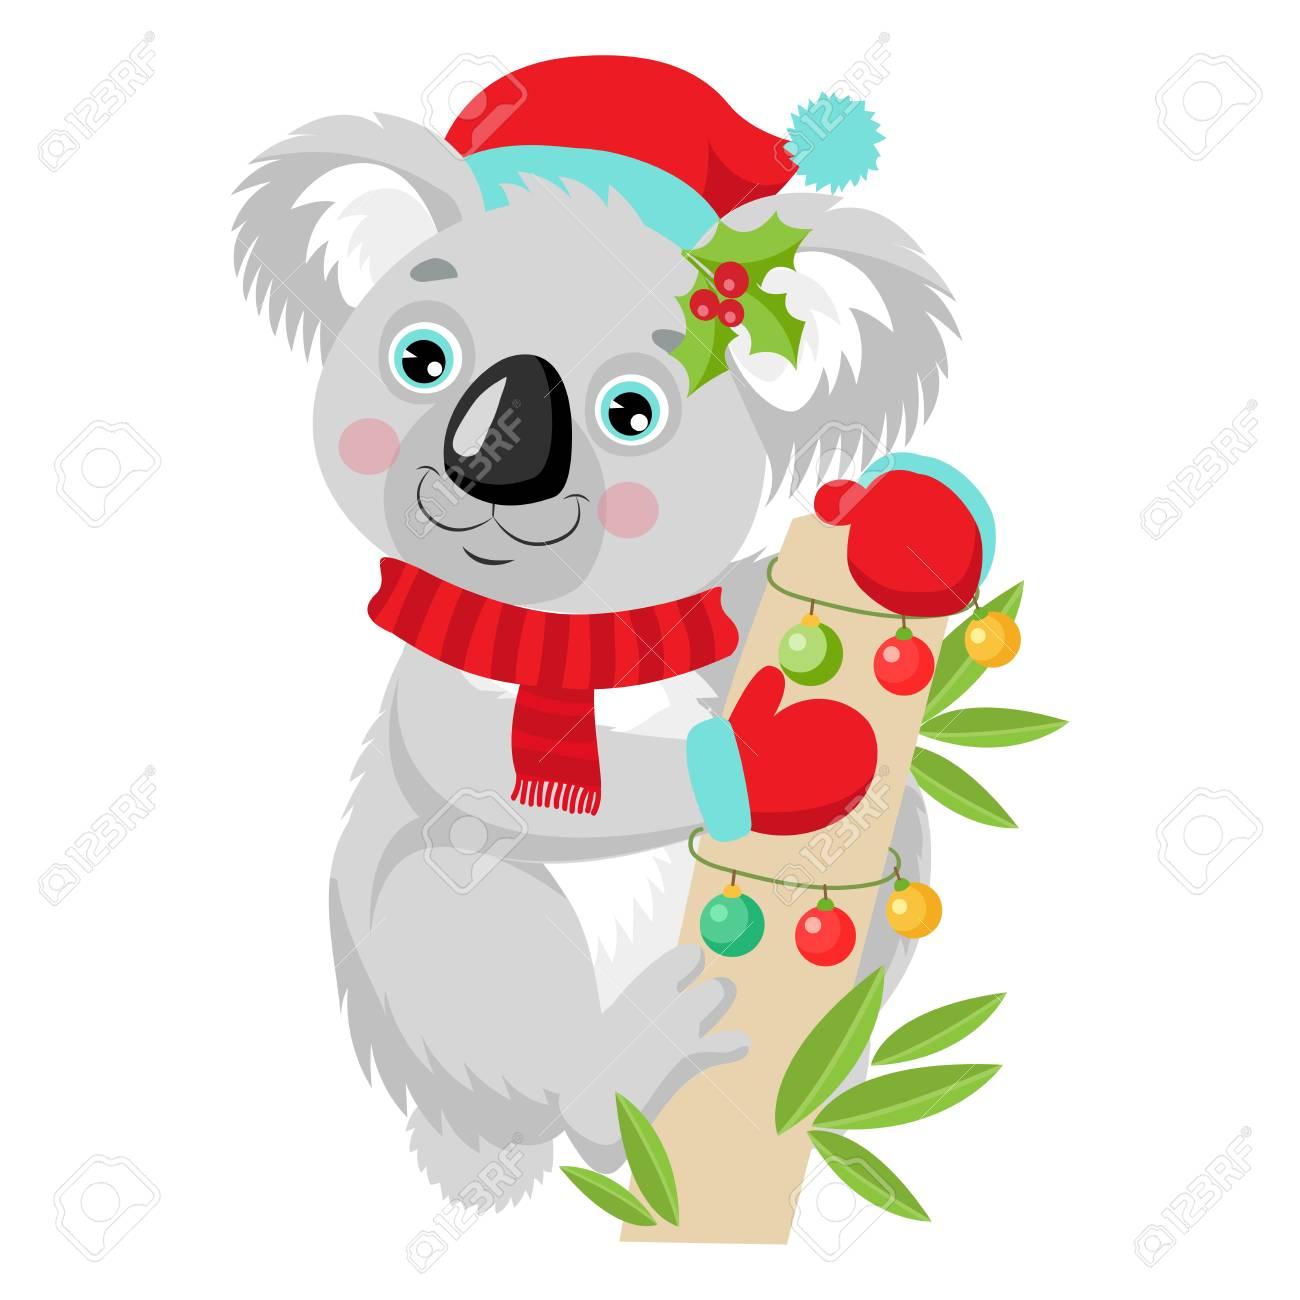 Funny Koala Christmas Vector. Merry Christmas From Australia.